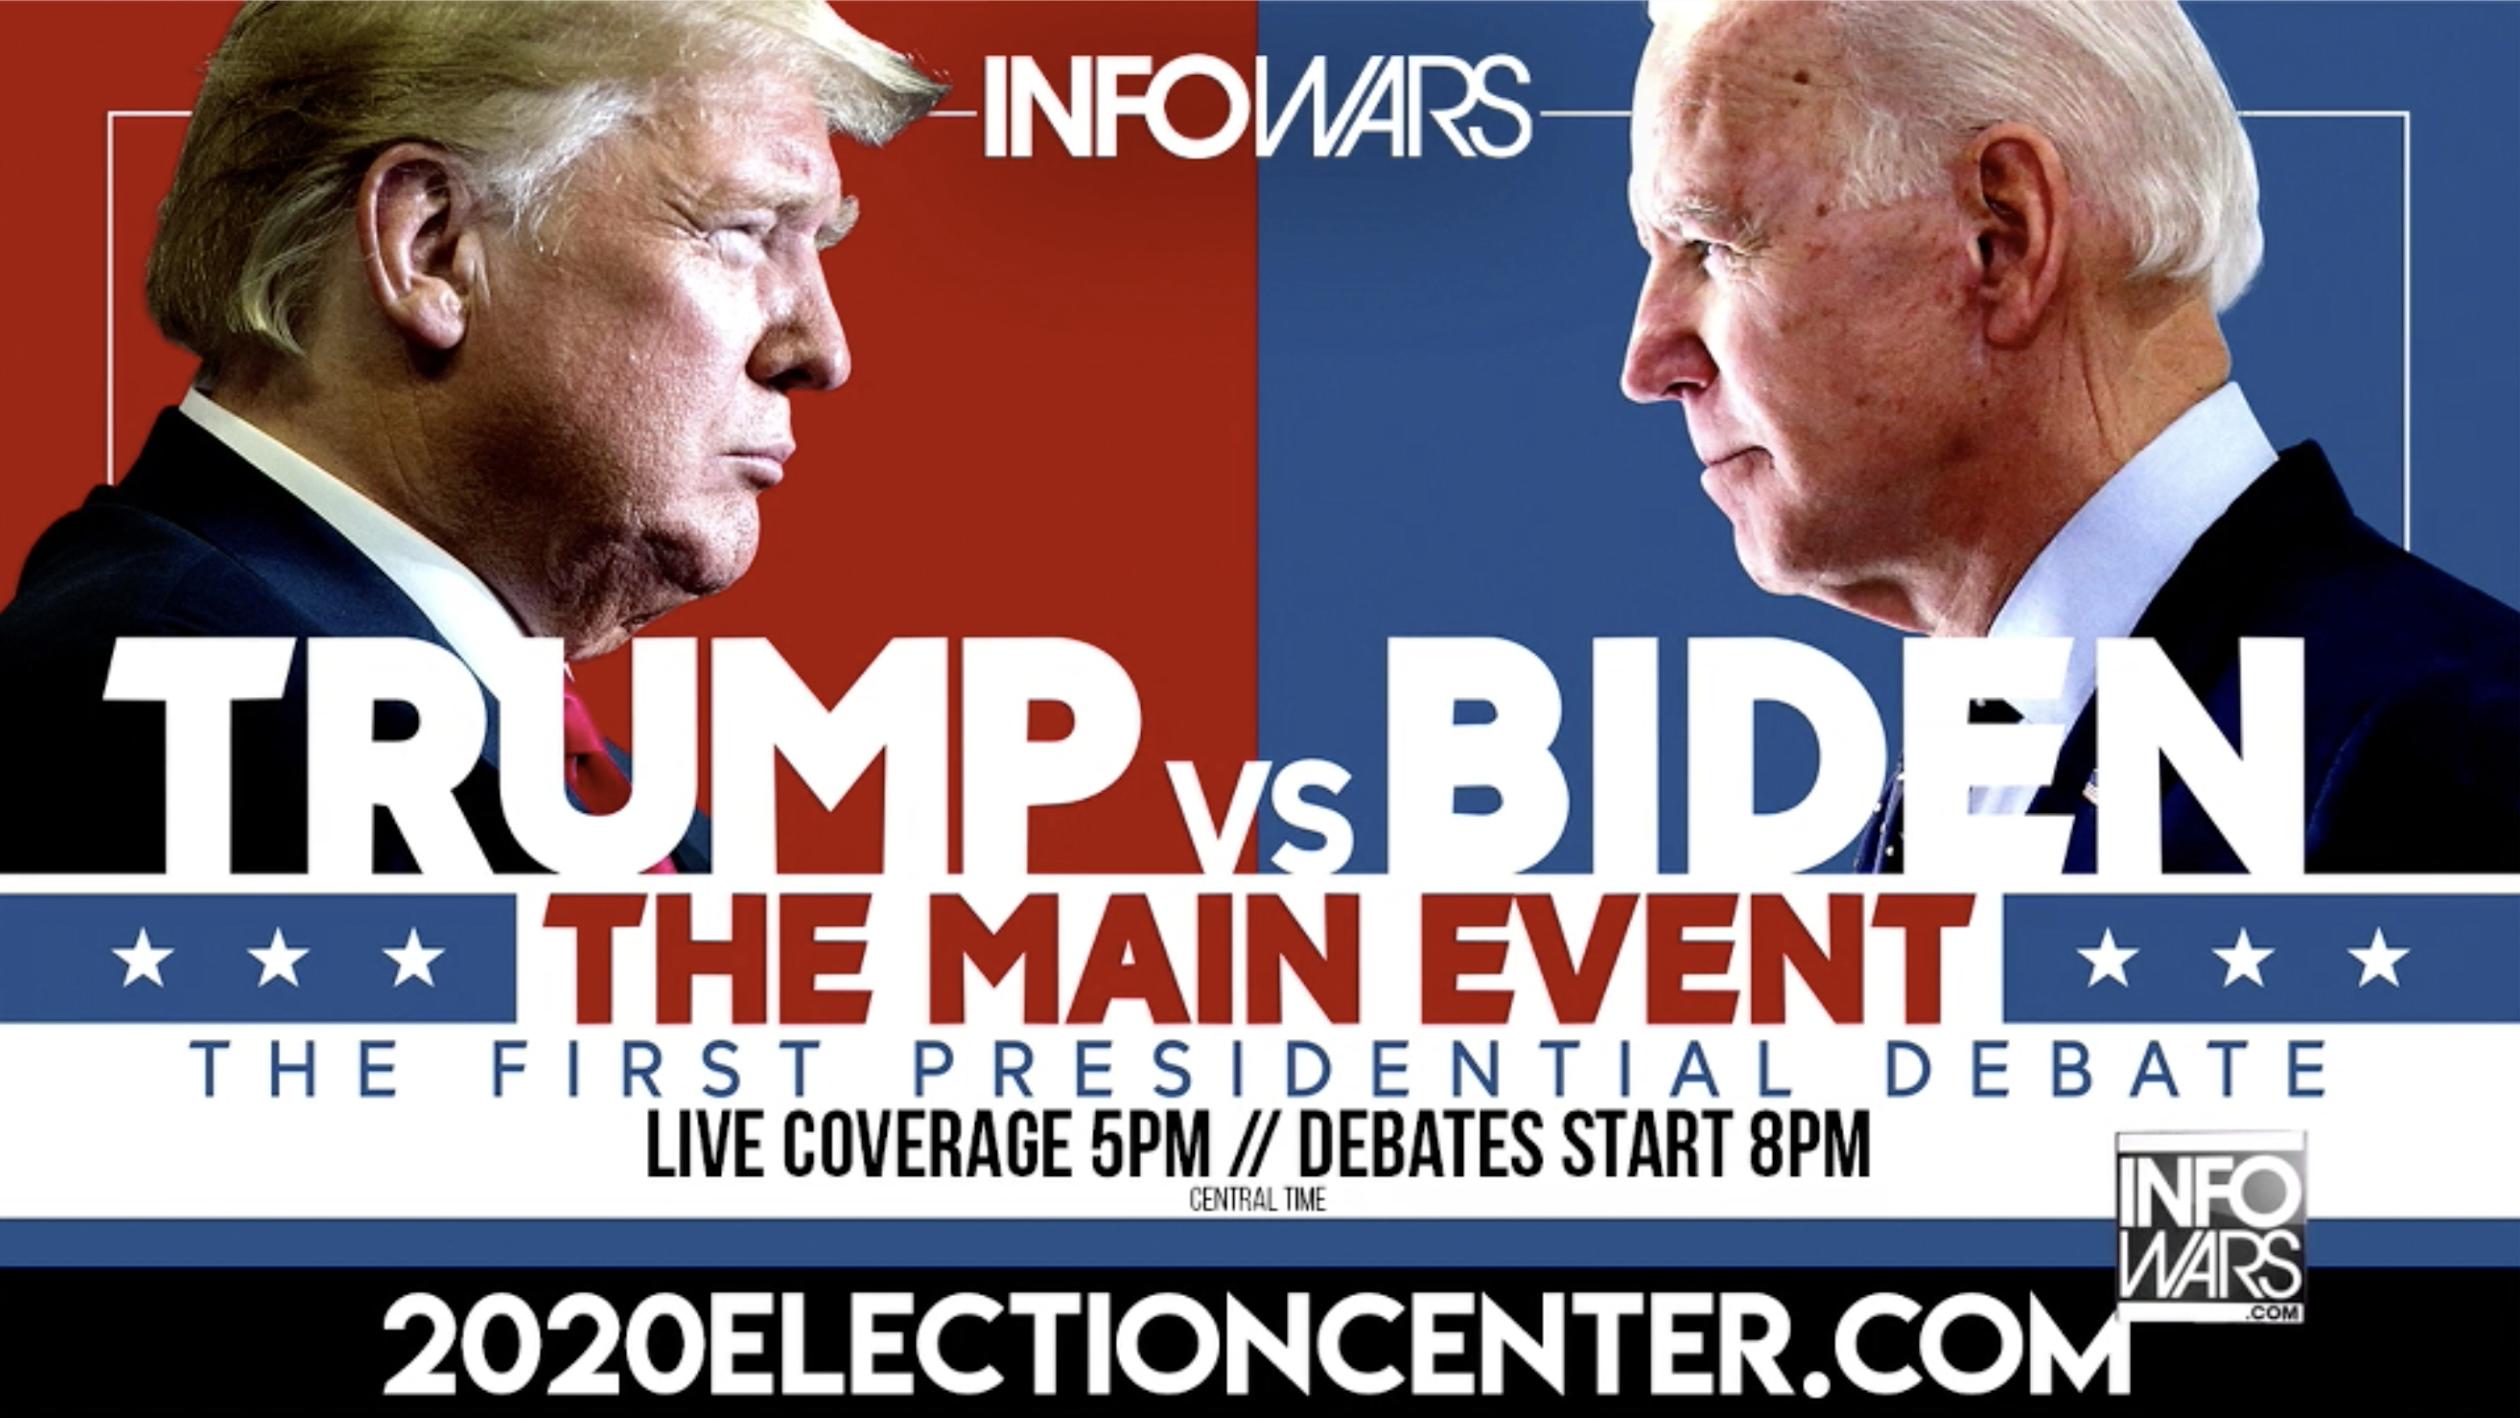 Alex Jones Infowars Trump biden 1st Presidential Debate EXZM September 29th 2020